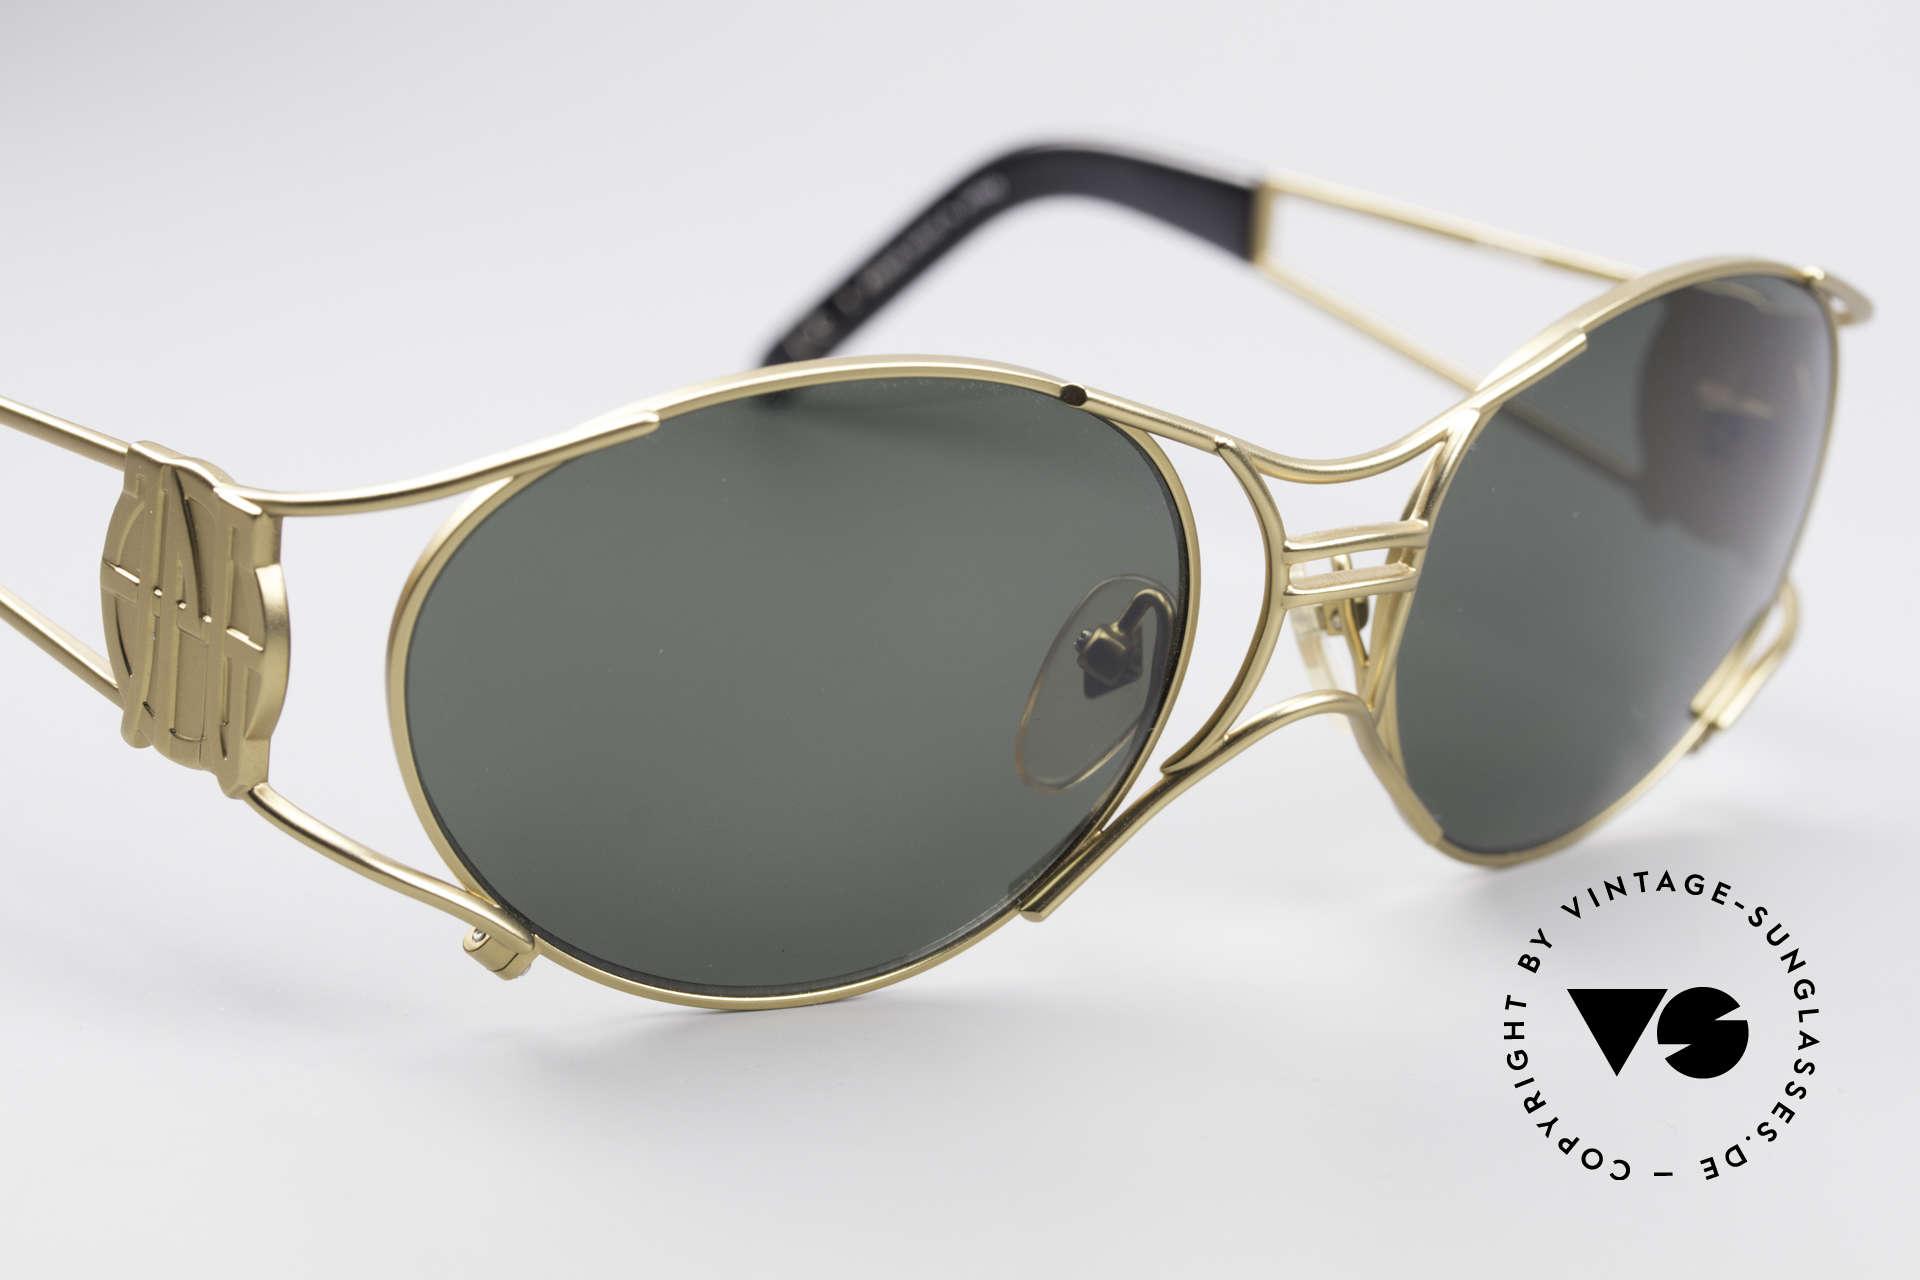 Jean Paul Gaultier 58-6101 90's Steampunk Sunglasses, unworn original (collector's item & true eye-catcher), Made for Men and Women